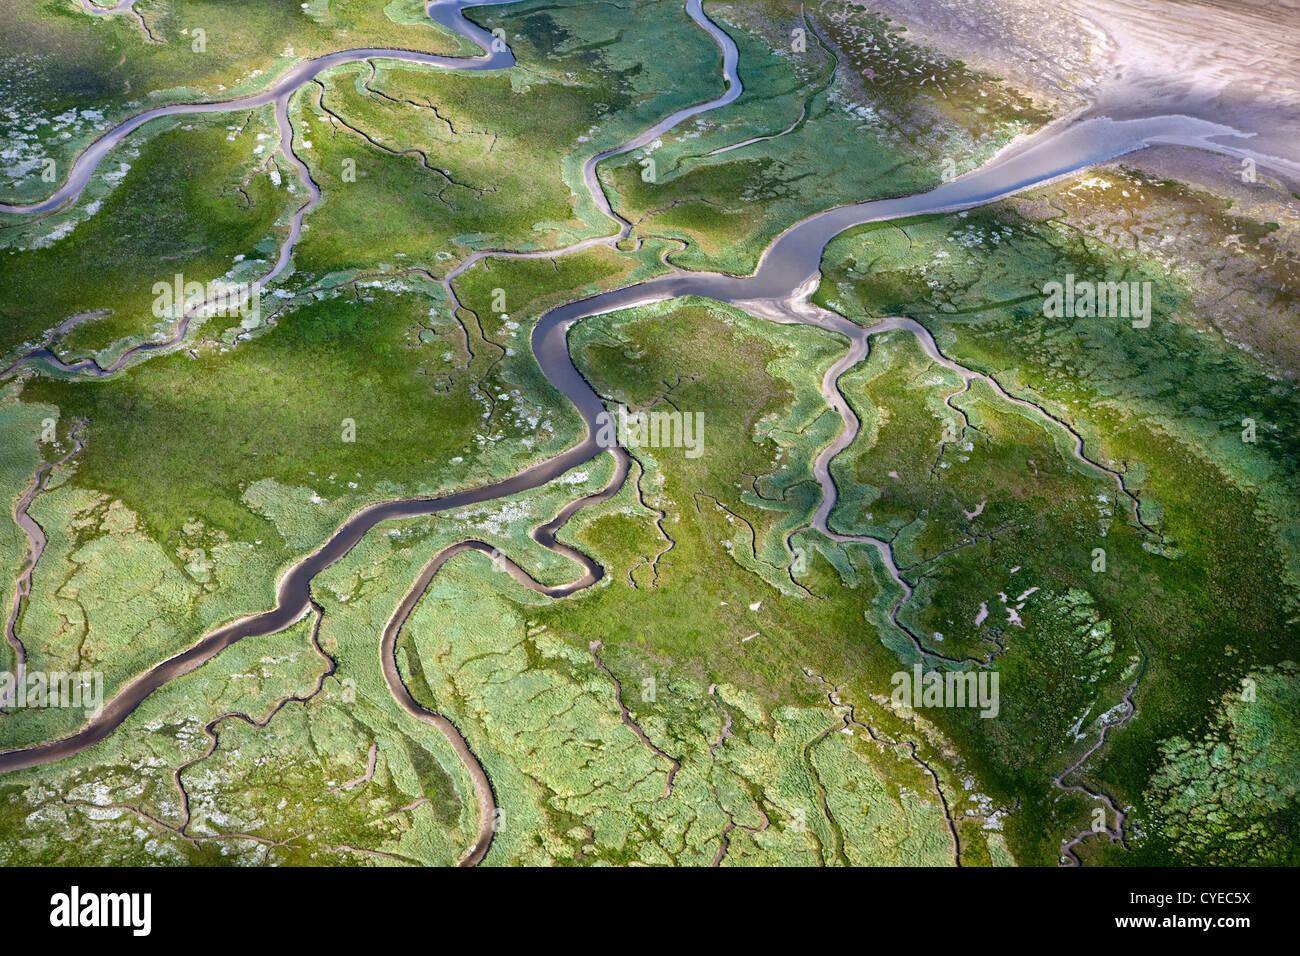 Schiermonnikoog Insel gehört zum Wadden Sea Islands. UNESCO-Weltkulturerbe. Luft. Marsh Land, Watten. Stockbild